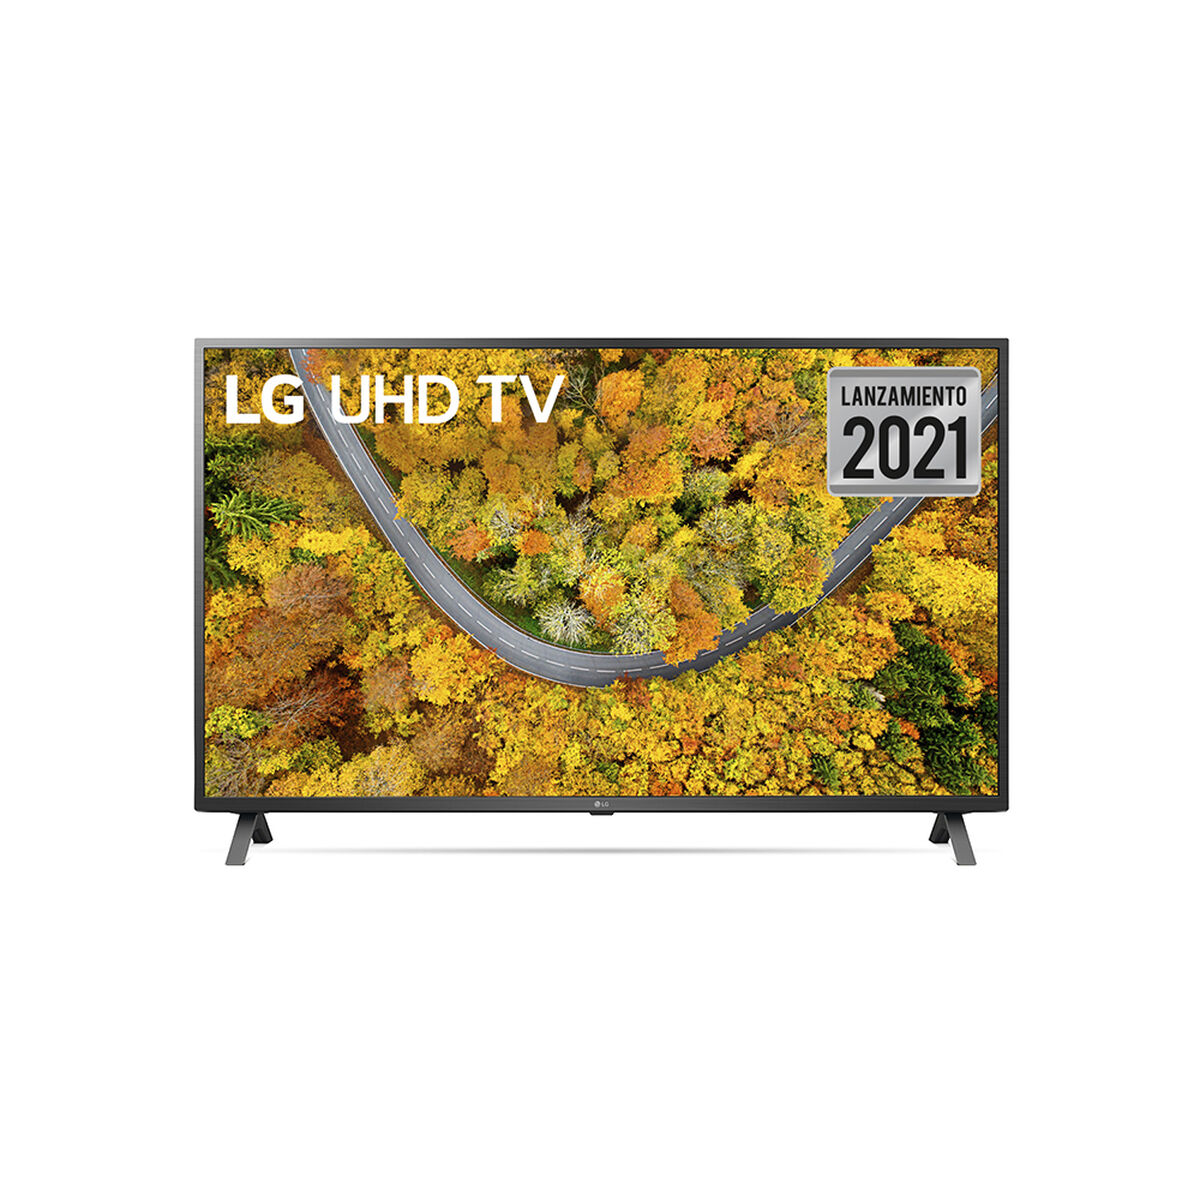 "LED 55"" LG 55UP7500PSF Smart TV 4K UHD 2021"